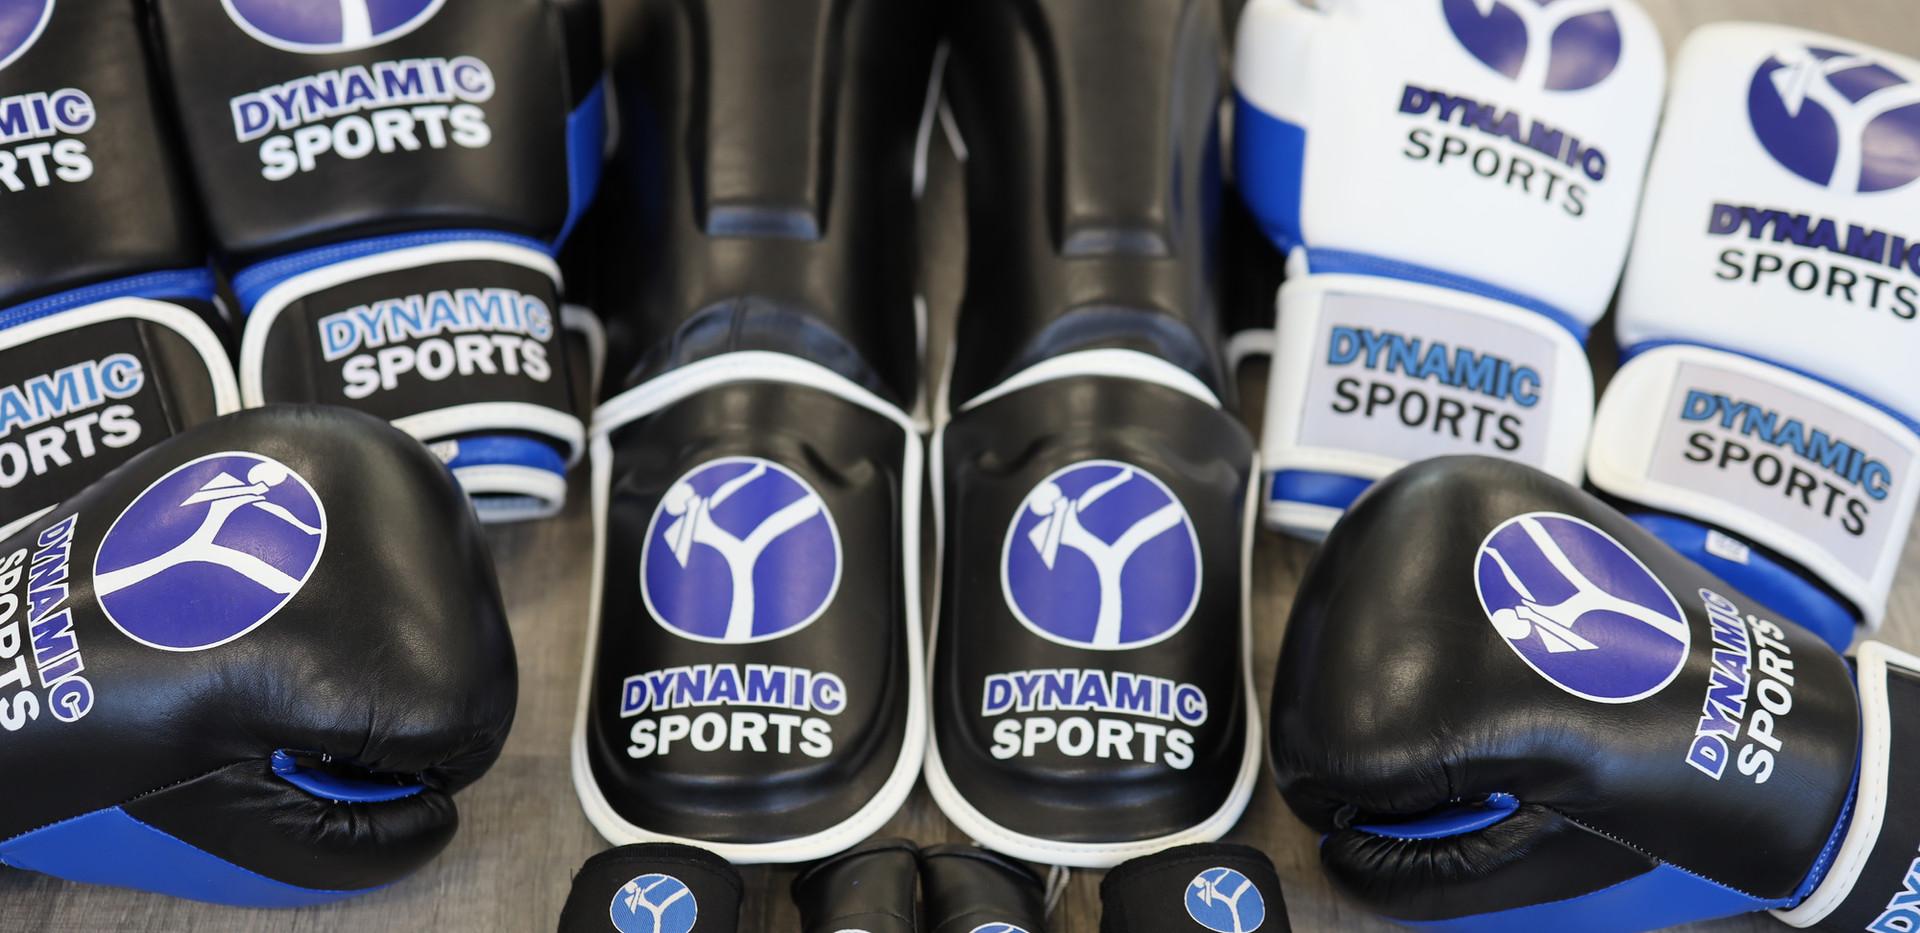 Dynamic Sports Kickboxing Basel Ausrüstung